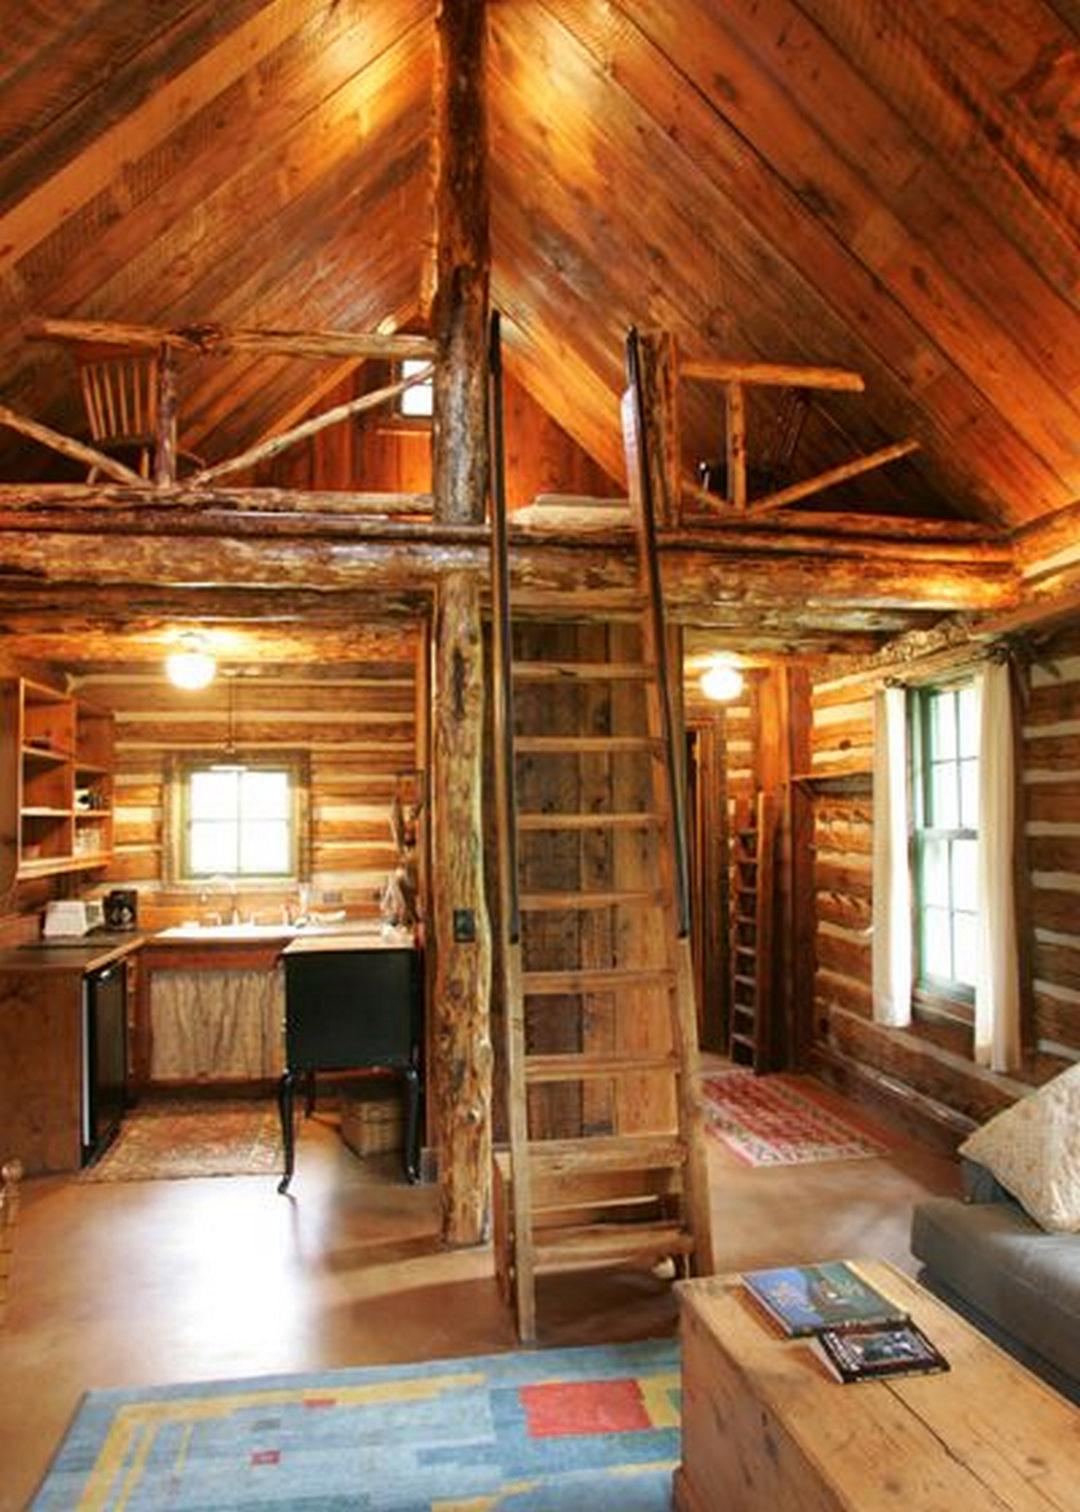 49 Gorgeous Rustic Cabin Interior Ideas | Gorgeous ...